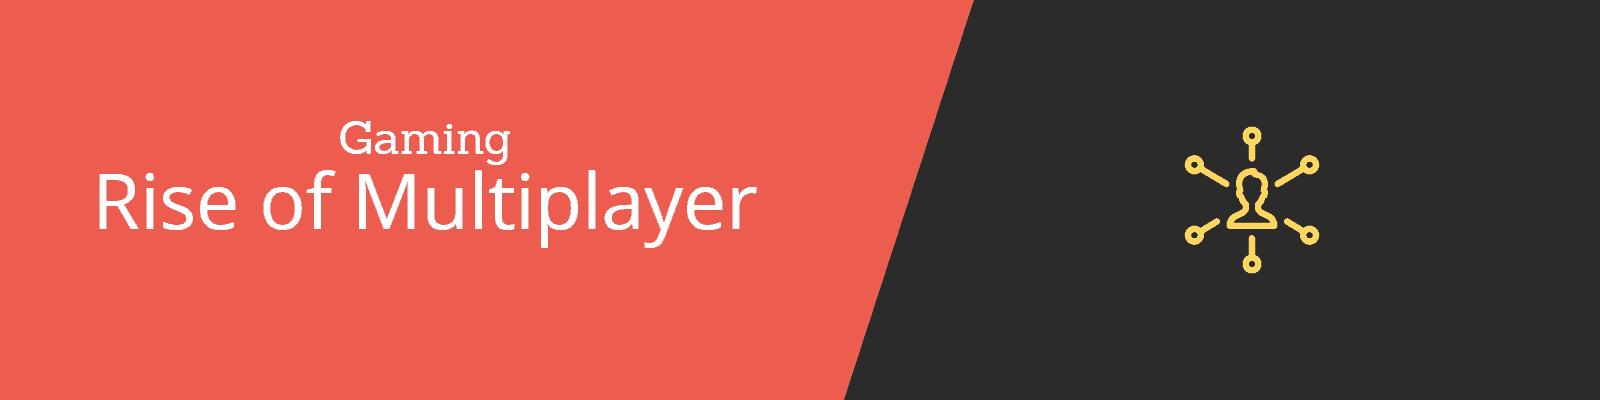 Multiplayer Online Gaming